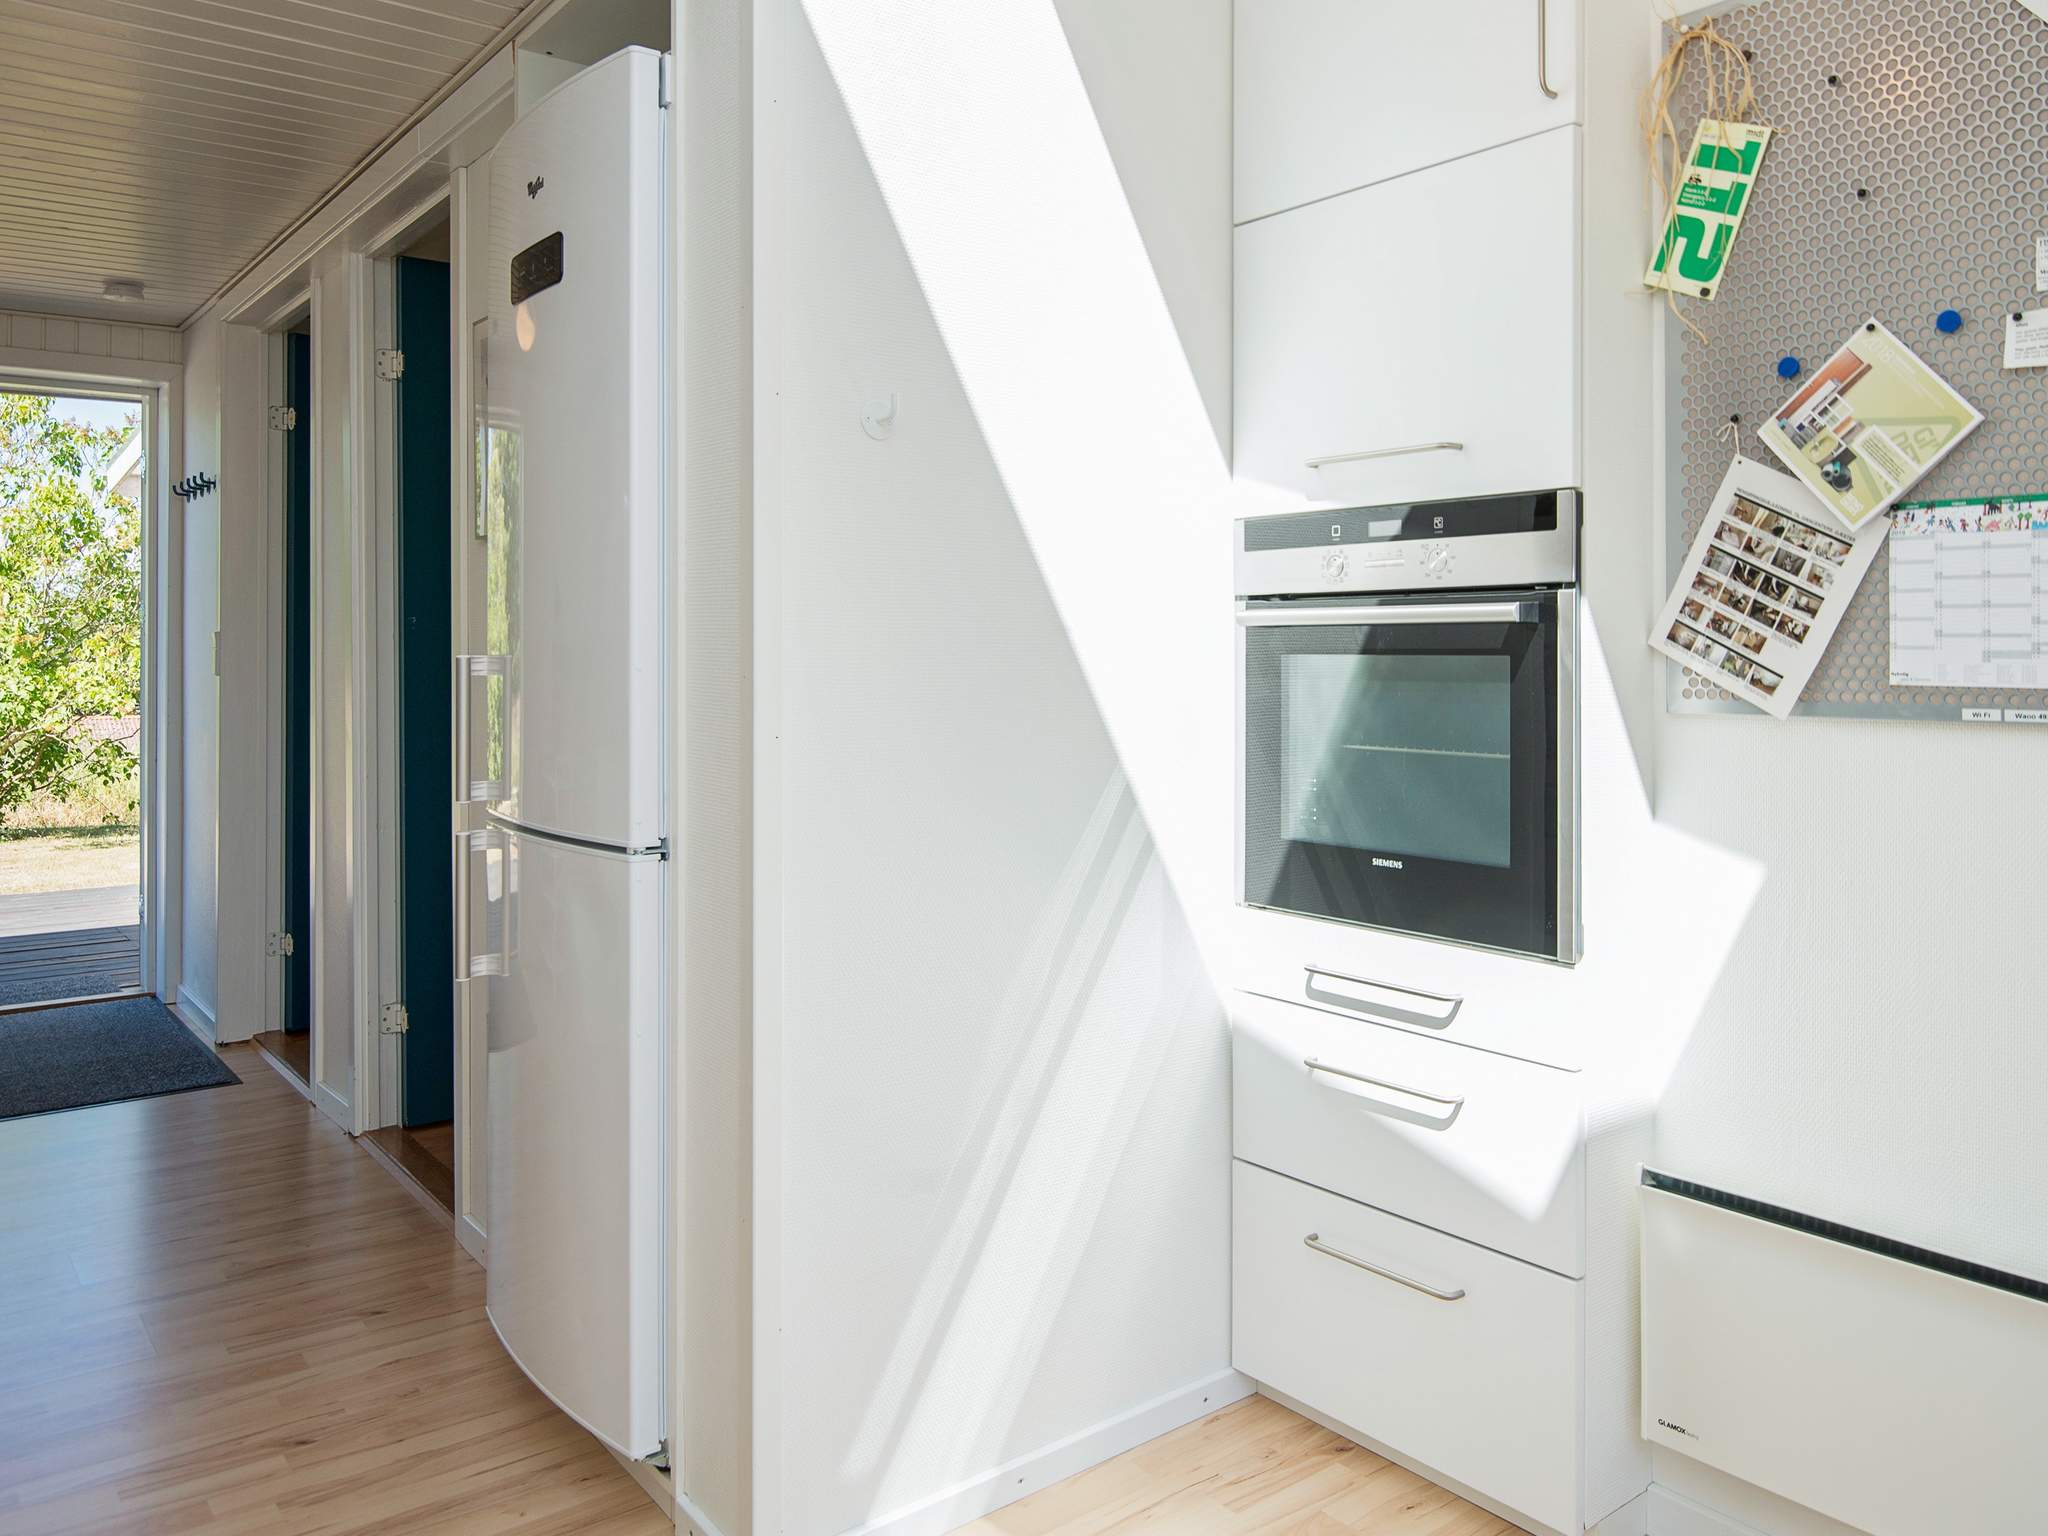 Maison de vacances Helgenæs (978615), Knebel, , Mer Baltique danoise, Danemark, image 6